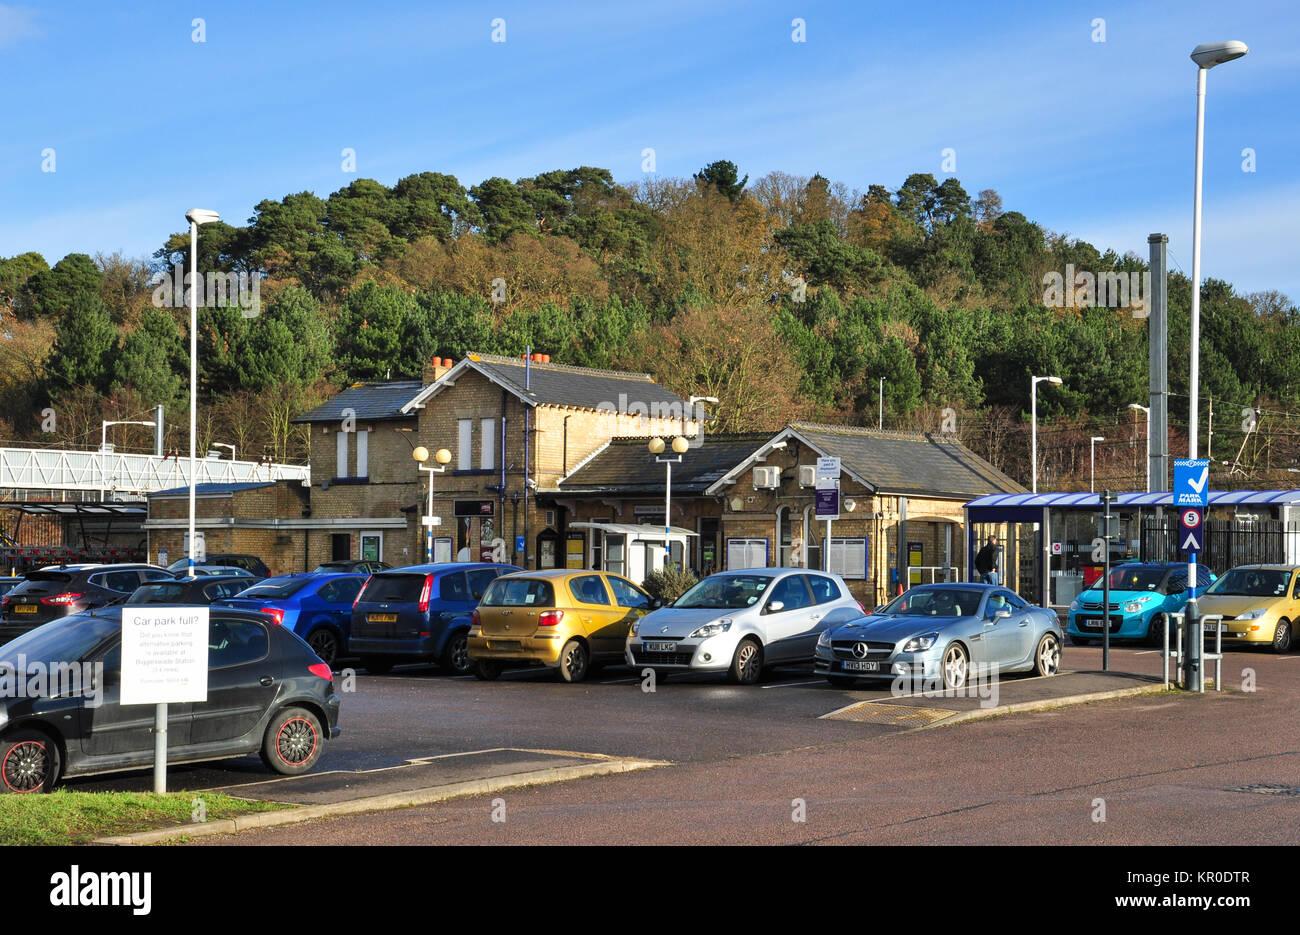 Hillingdon Railway Station Car Park